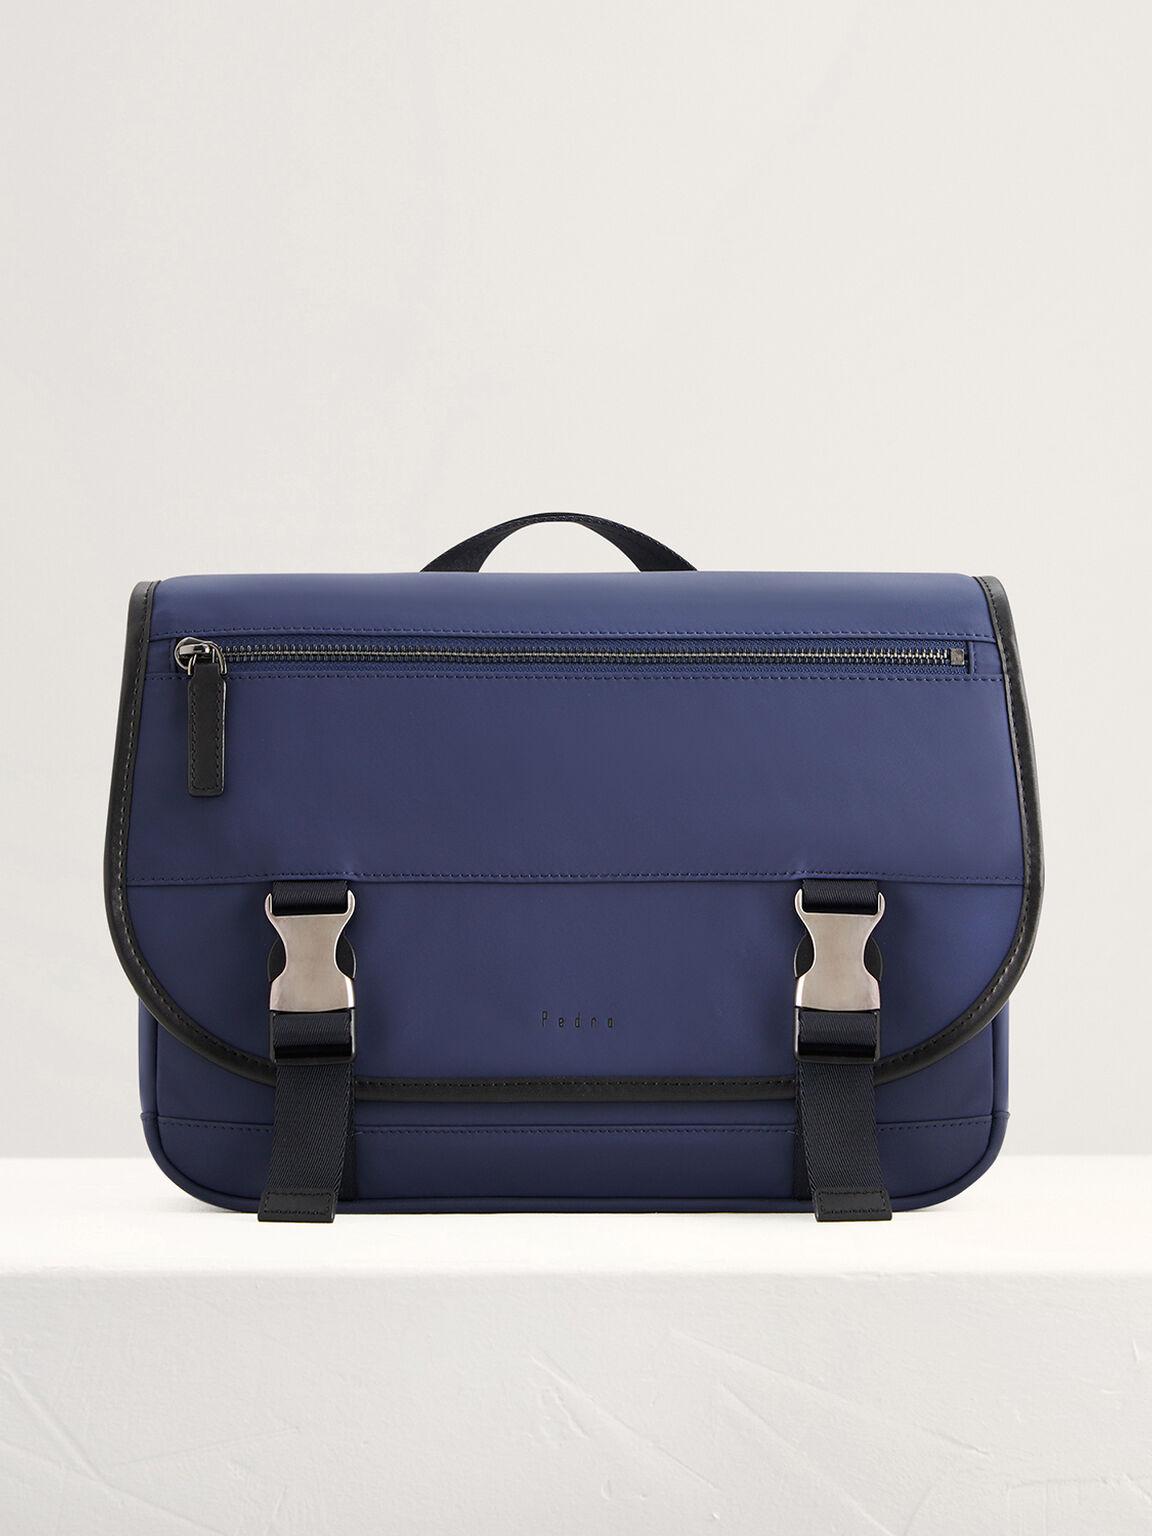 Two-Way Messenger Bag, Navy, hi-res